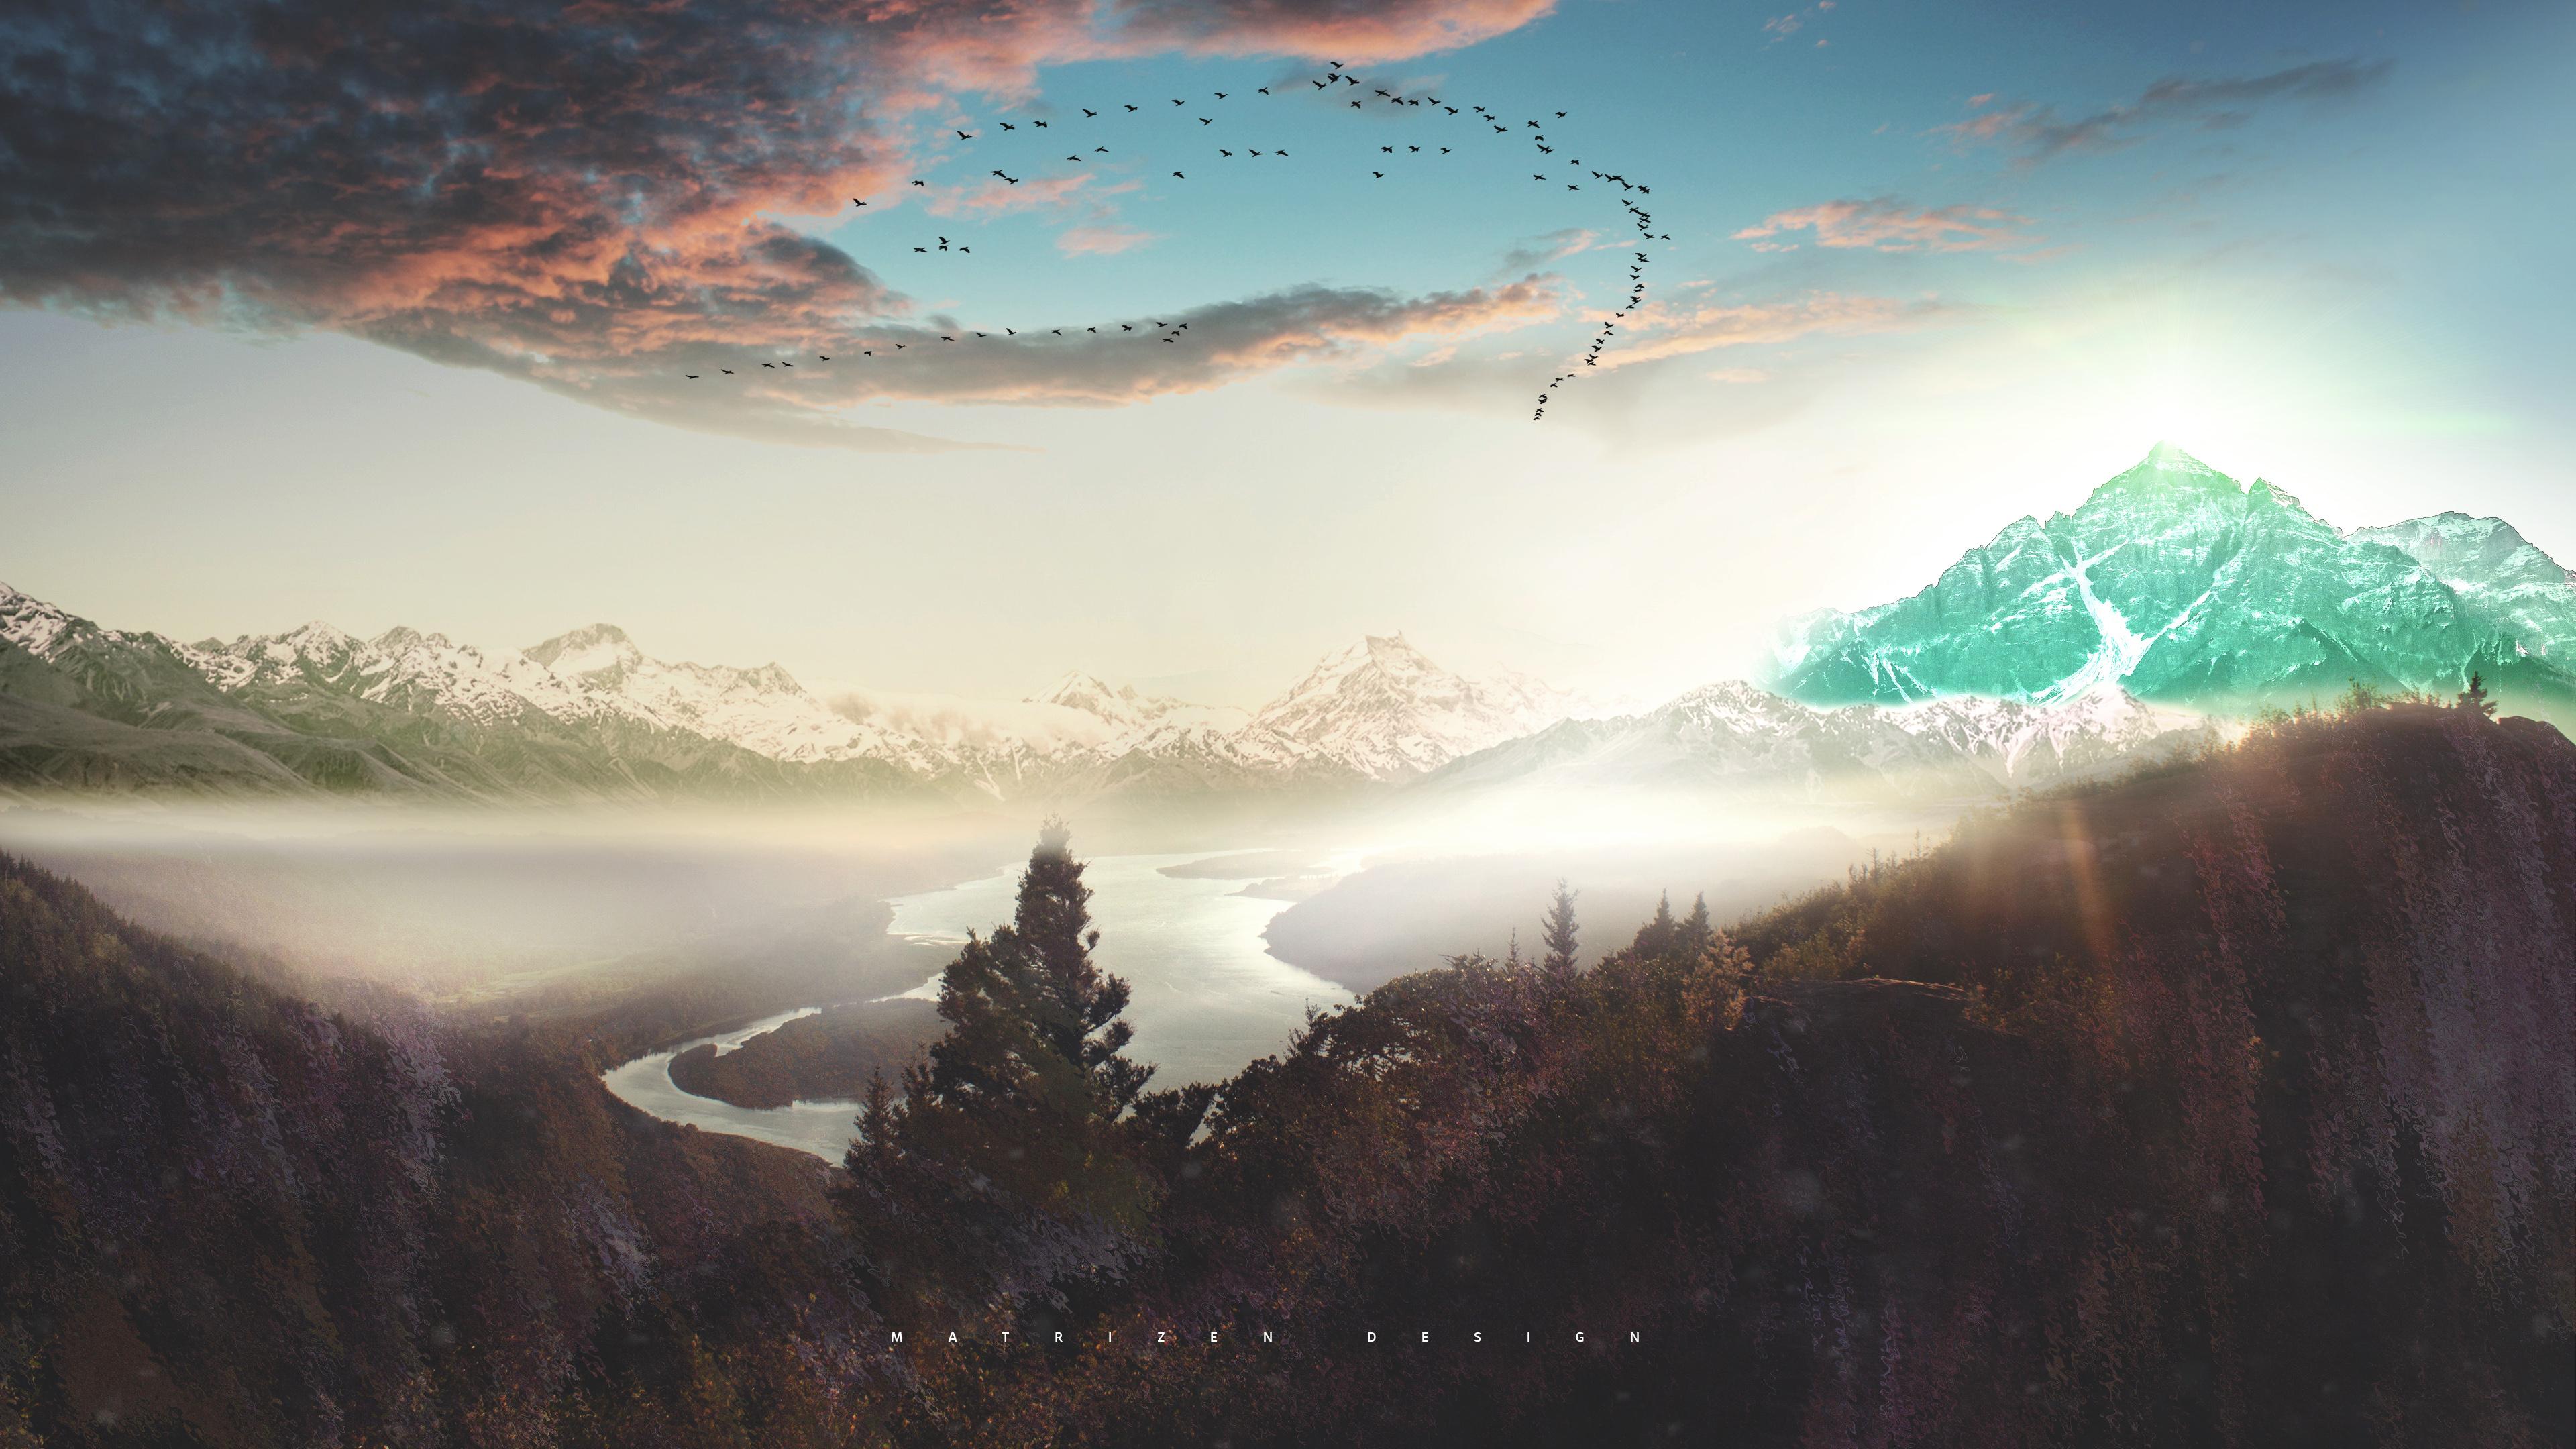 Photo Manipulation Mountains Clouds River Snow Sunset Concept Digital Art 4k